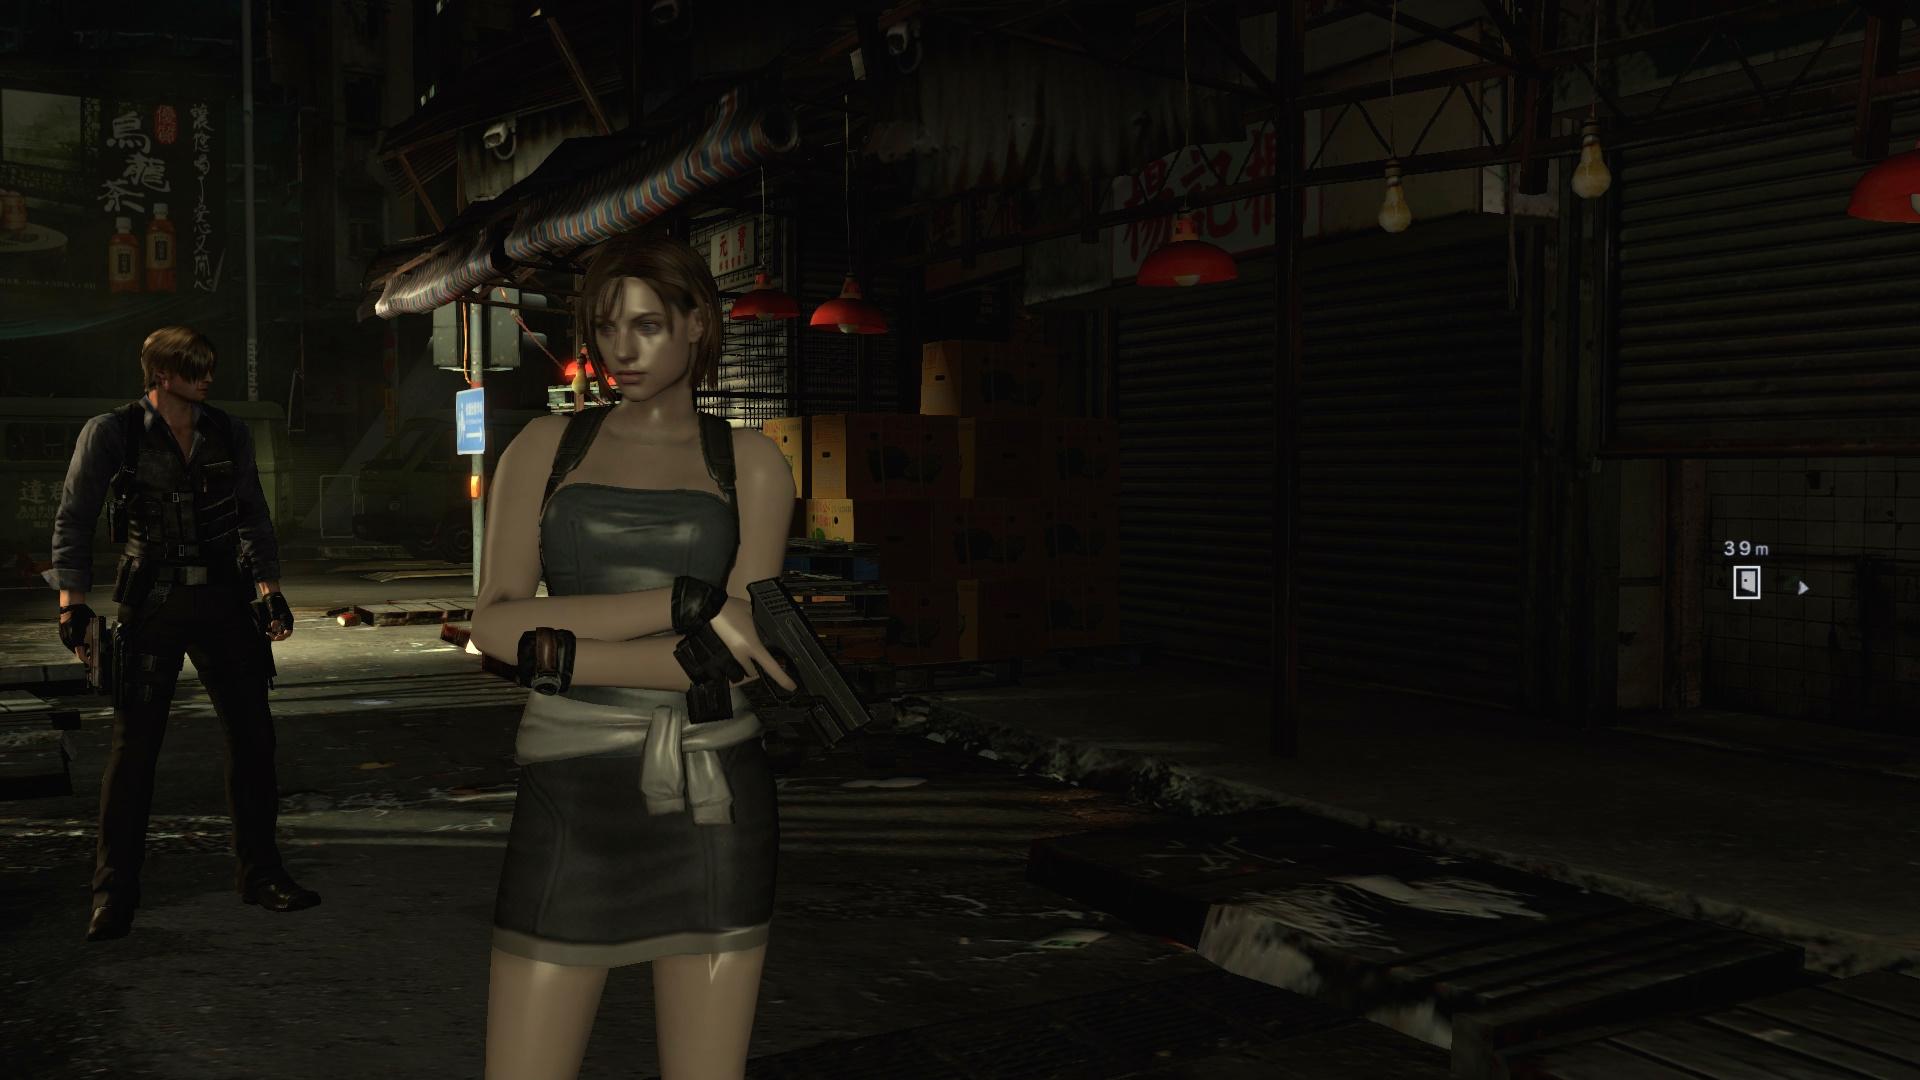 Jill Resident Evil 3 0_10a941_2ec7eb46_orig